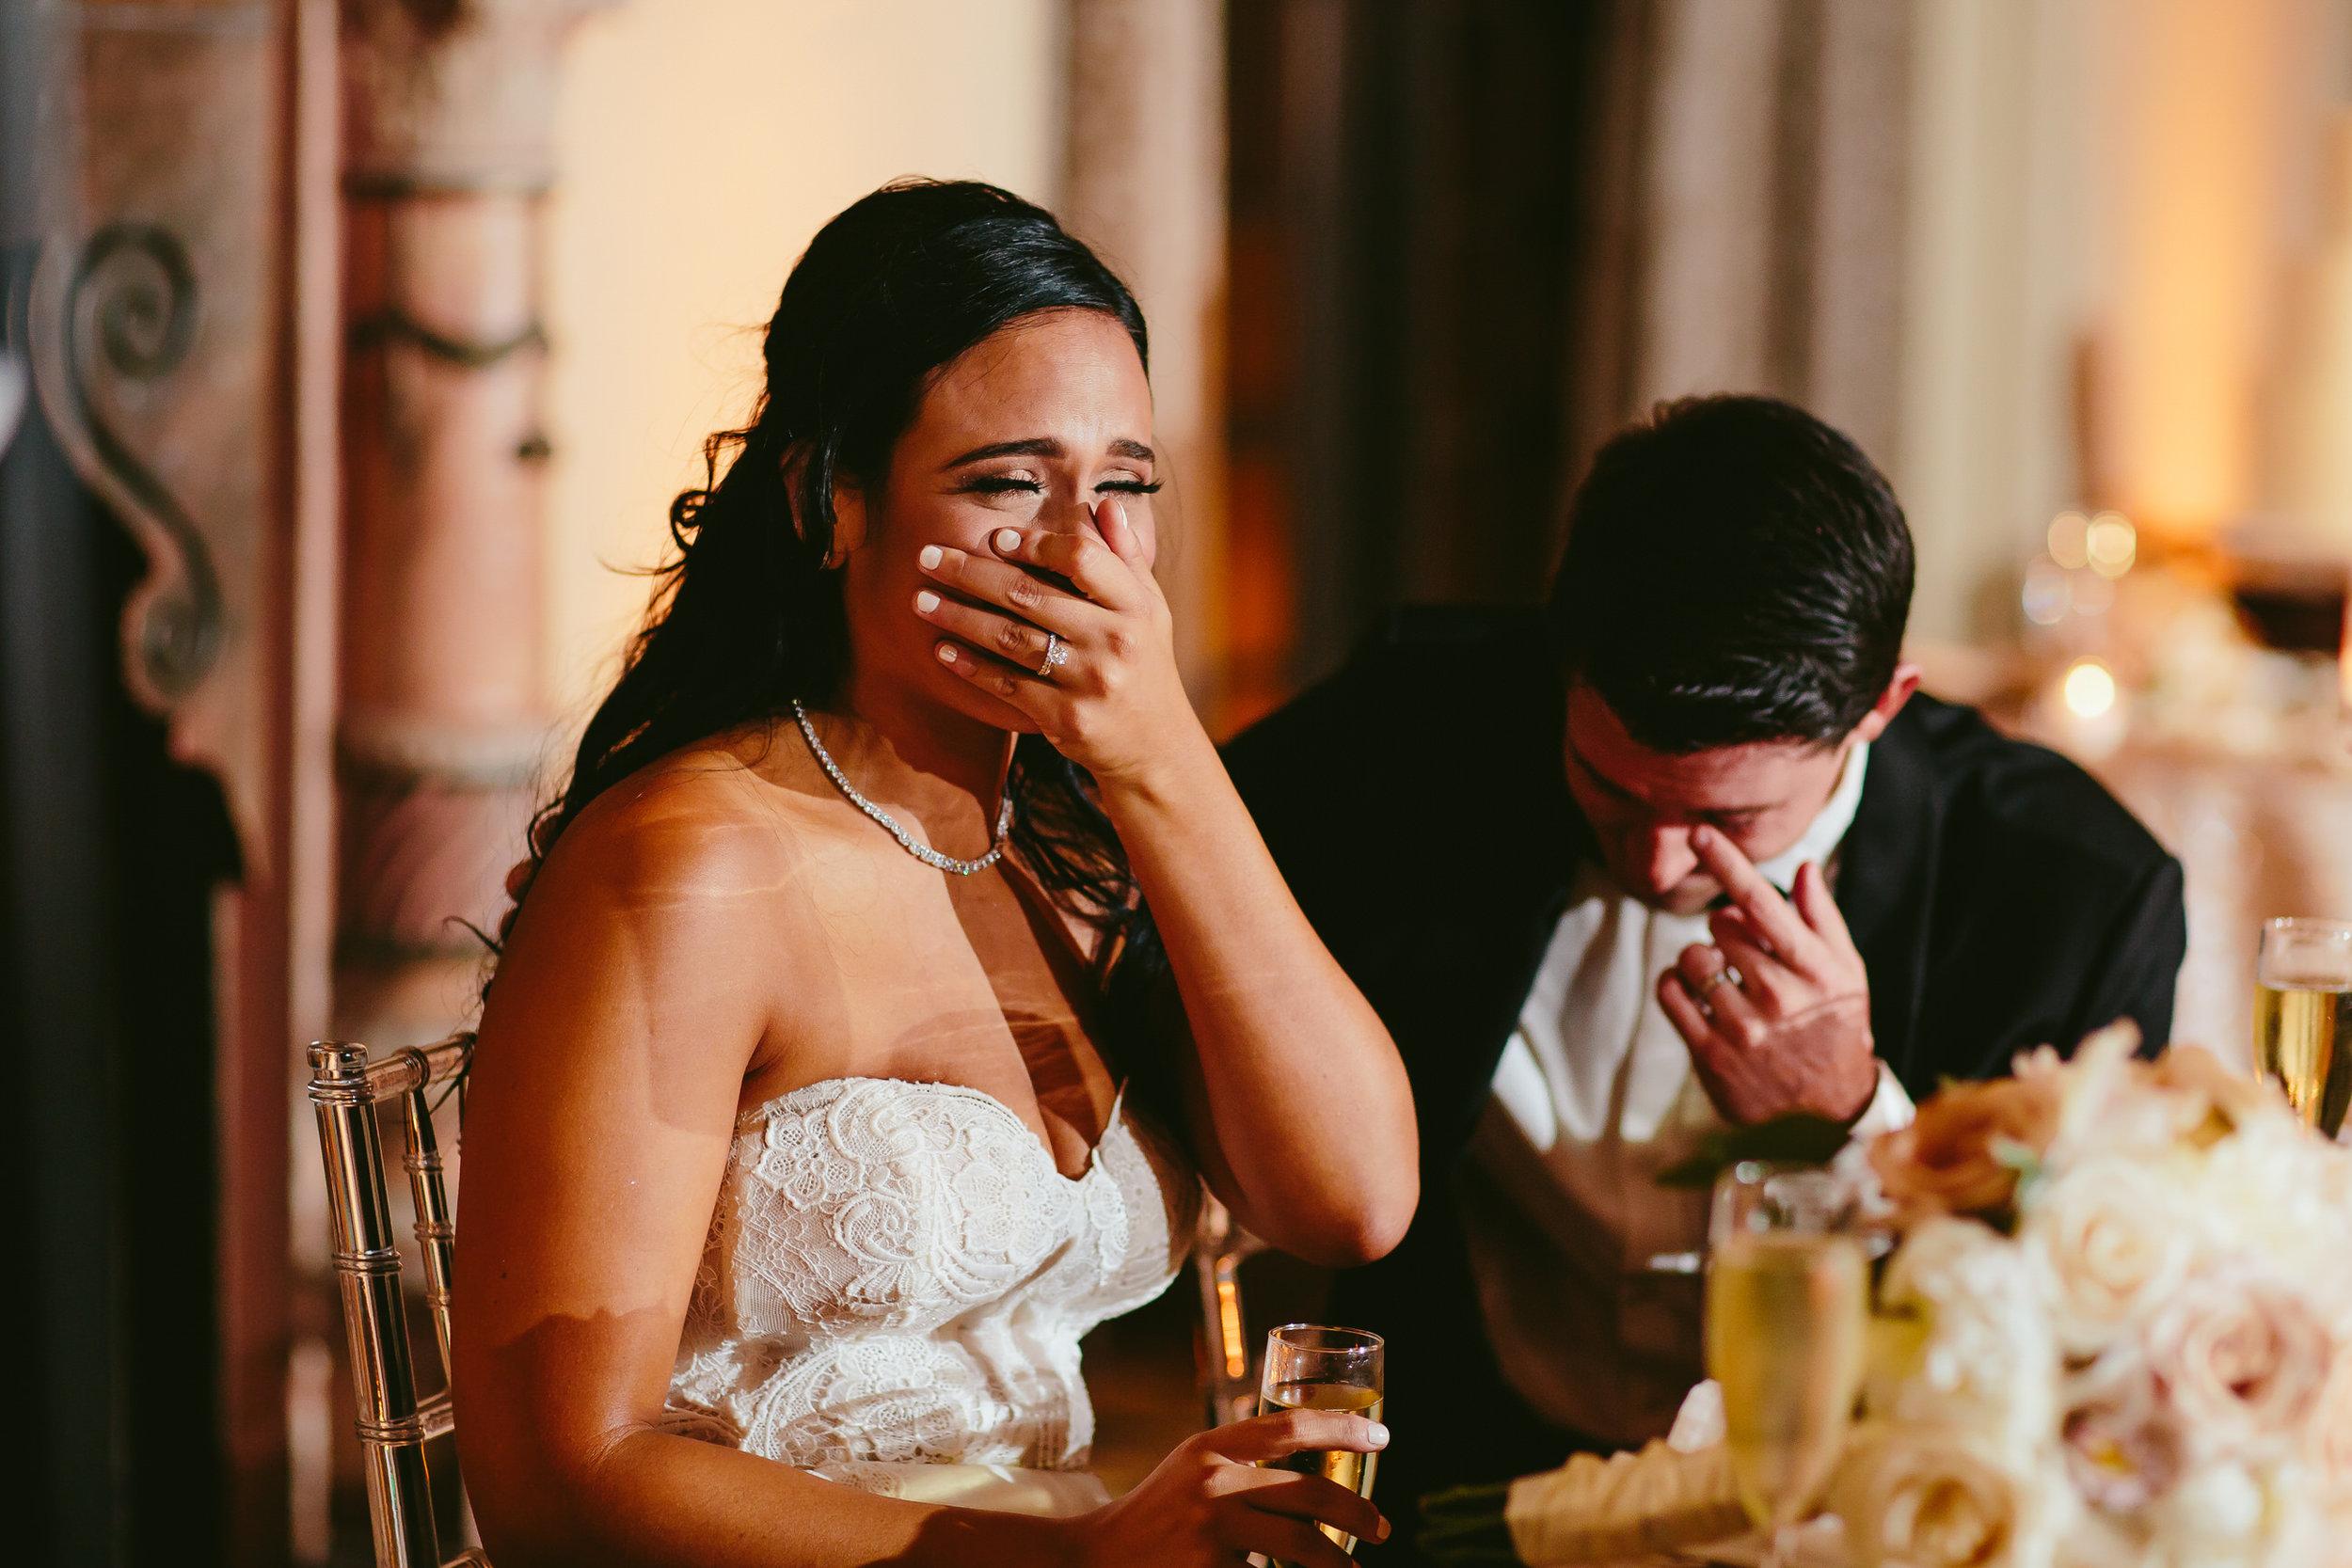 miami-biltmore-wedding-photographer-reception-party-22.jpg